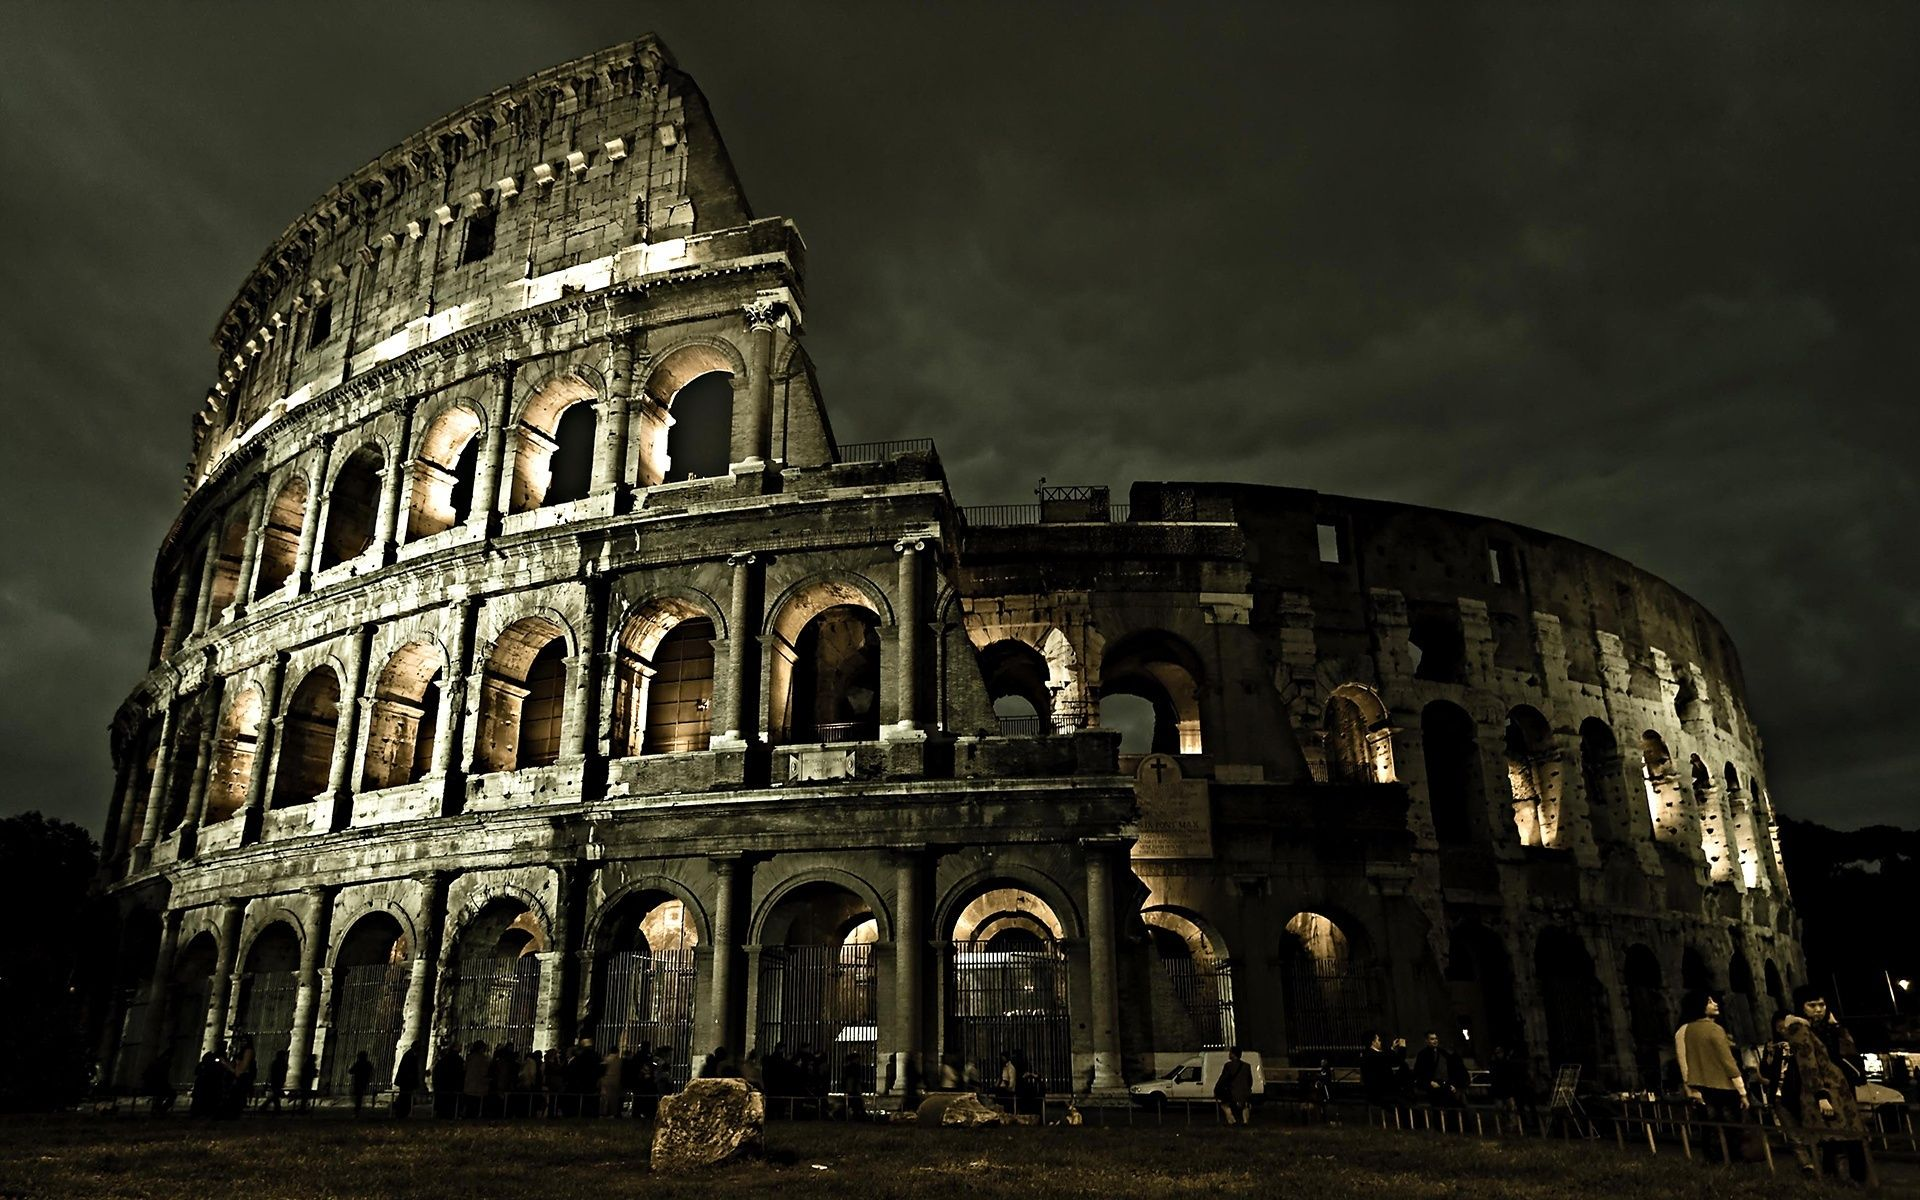 ColosseumRomanArchitecturejpg Imagen JPEG 1920 1200 pxeles